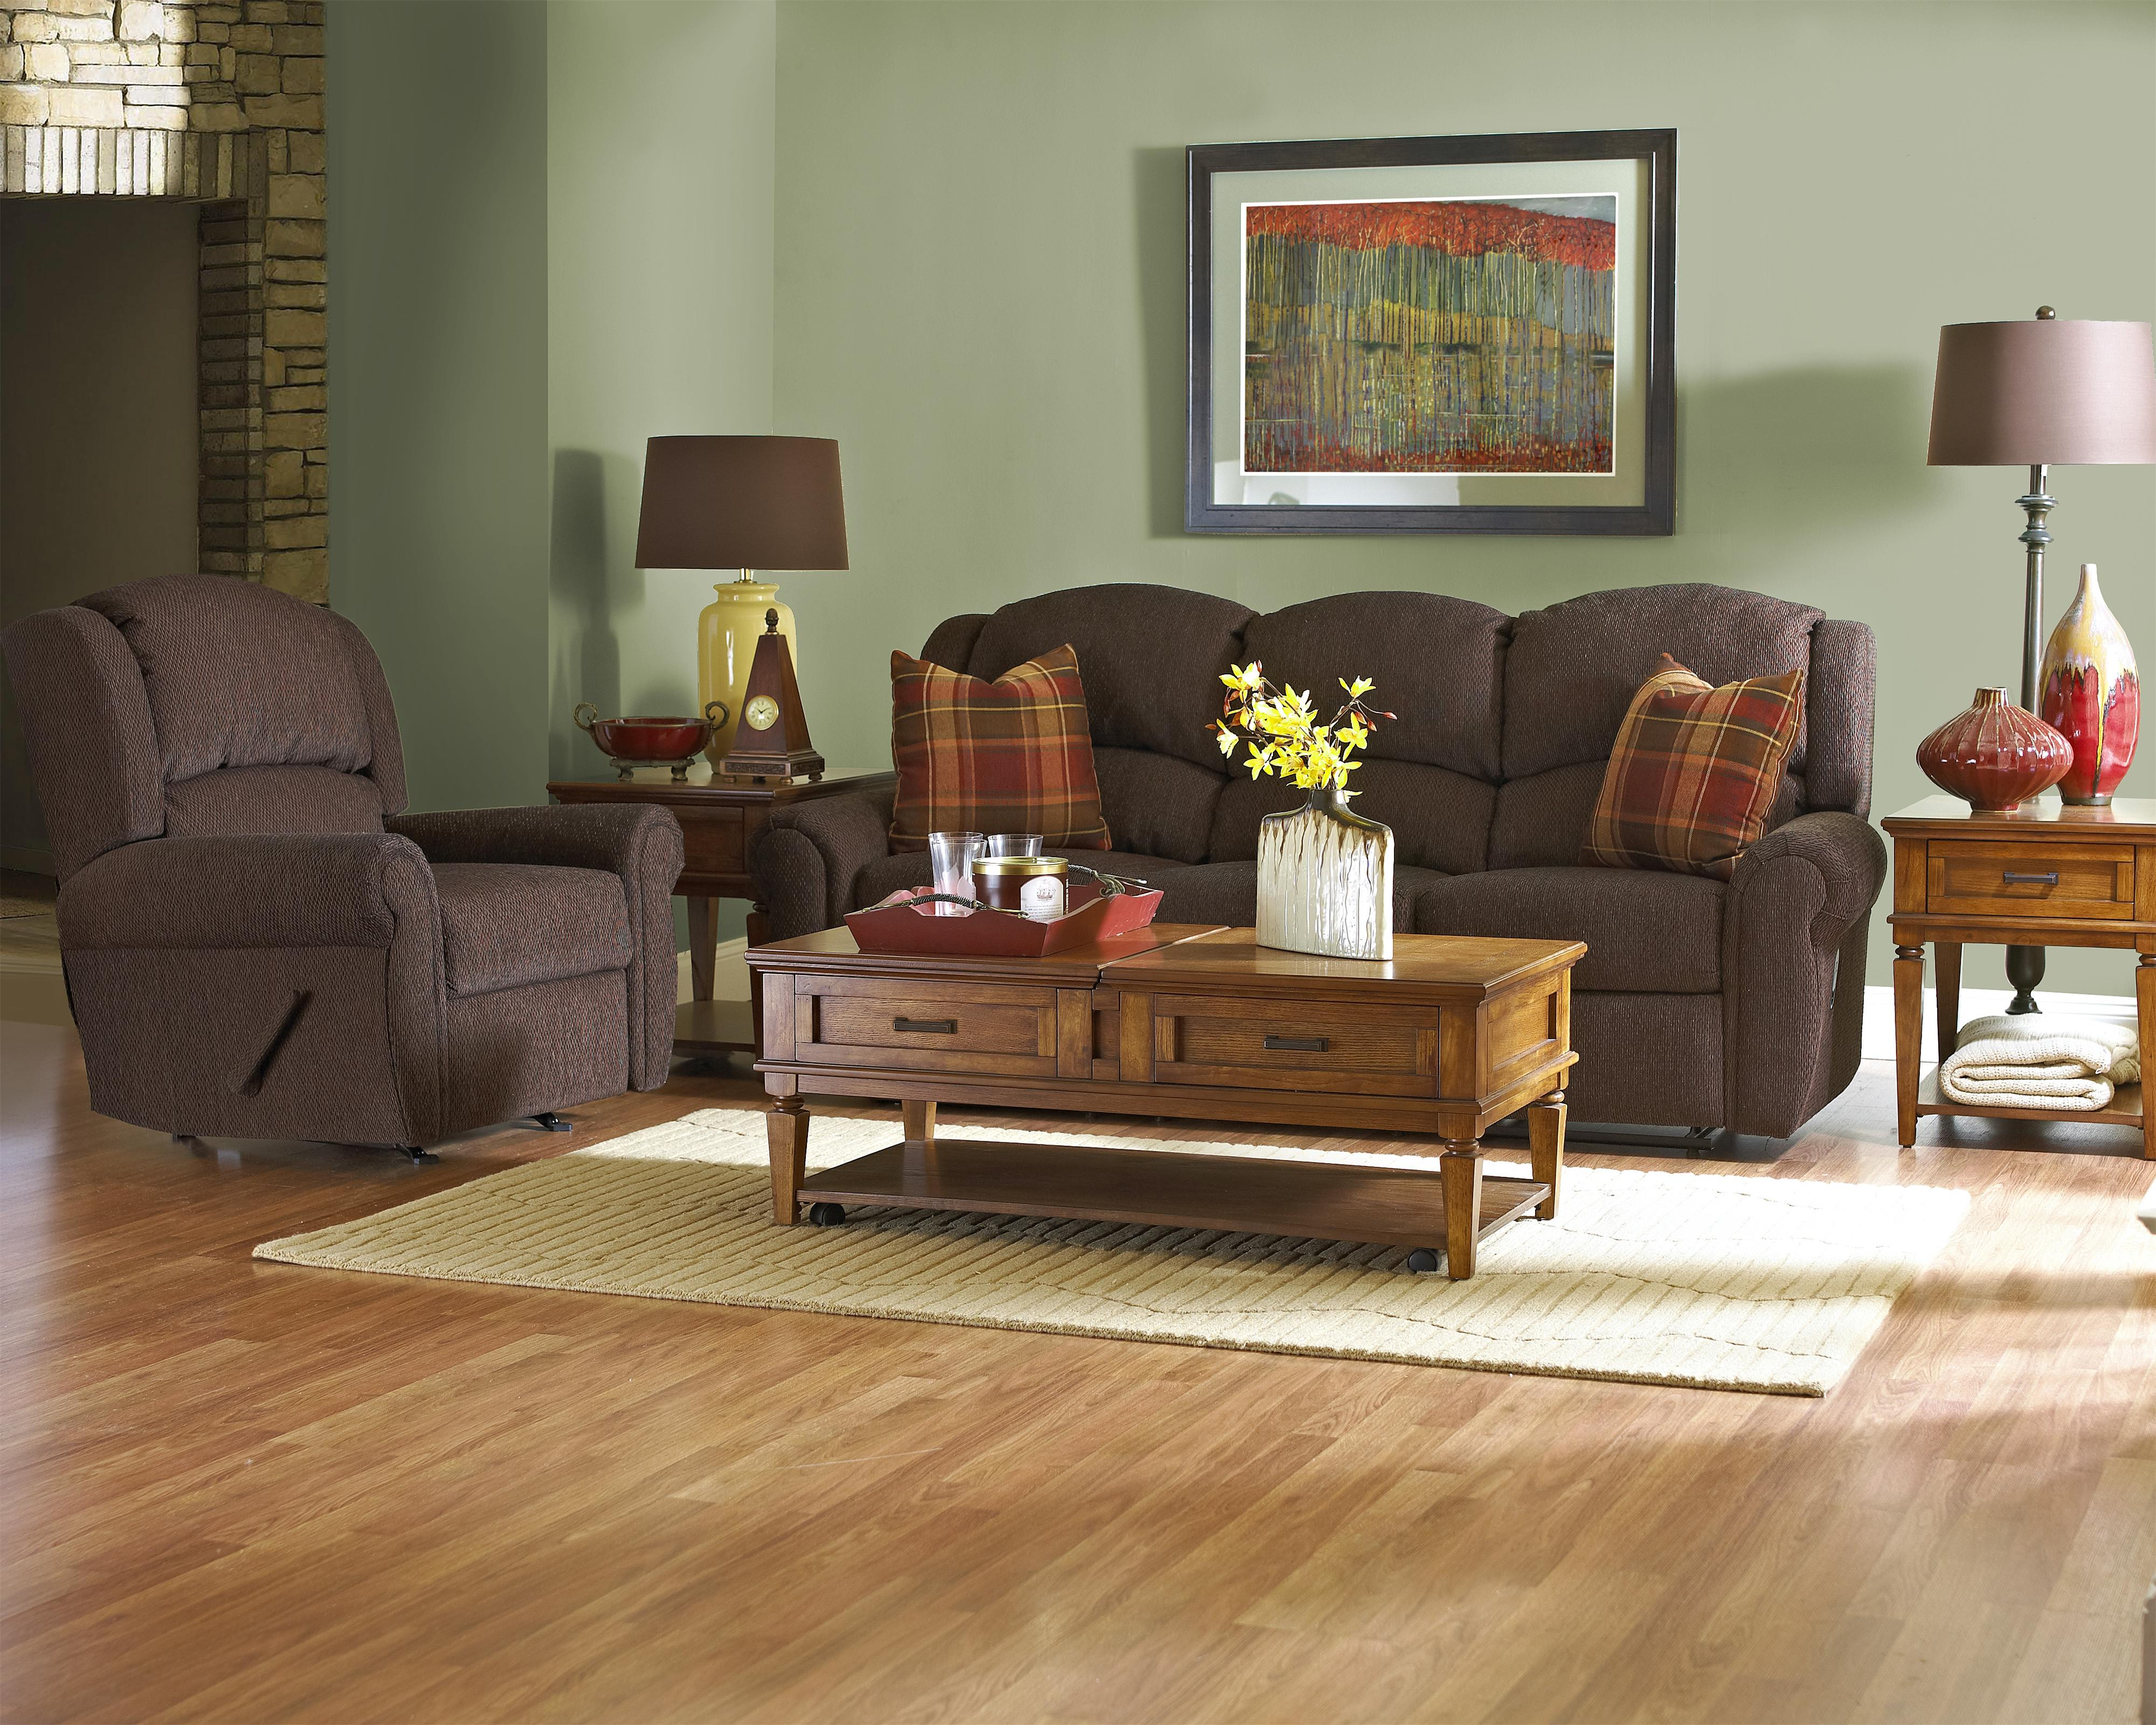 Klaussner Mcalister Reclining Living Room Group Olinde 39 S Furniture Reclining Living Room Group